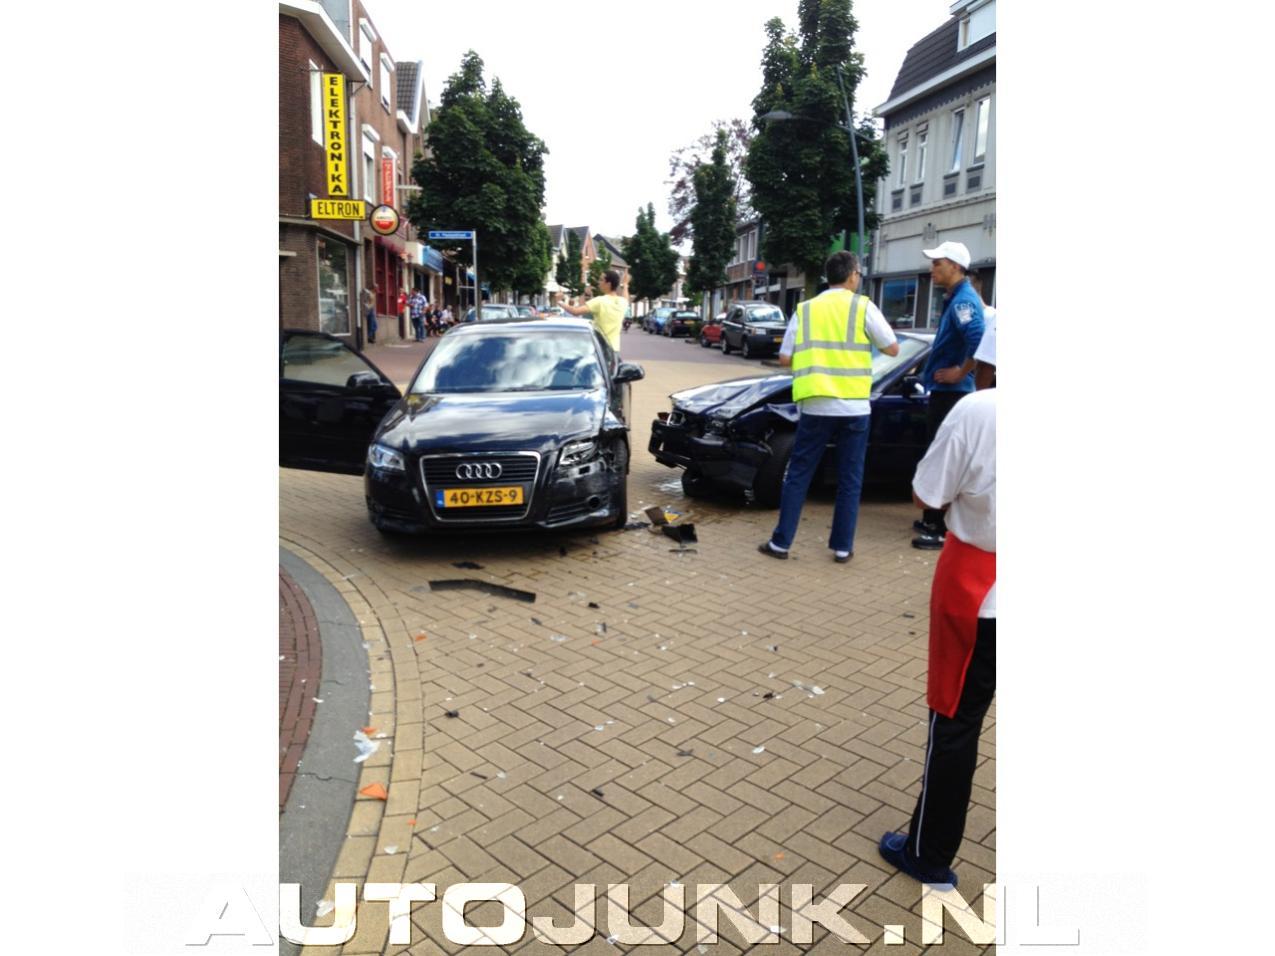 Audi A3 Ongeluk Prof Voetballer Foto S Autojunk Nl 96728